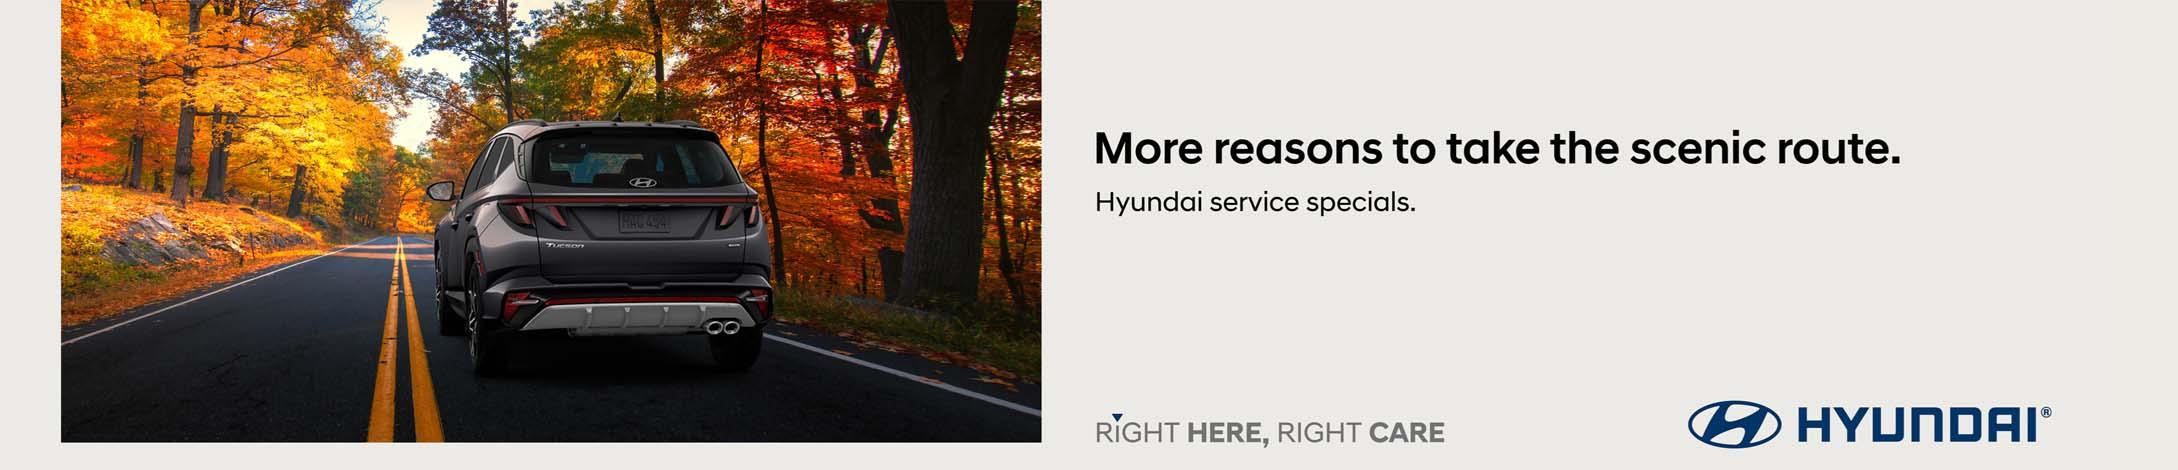 Finch Hyundai service specials